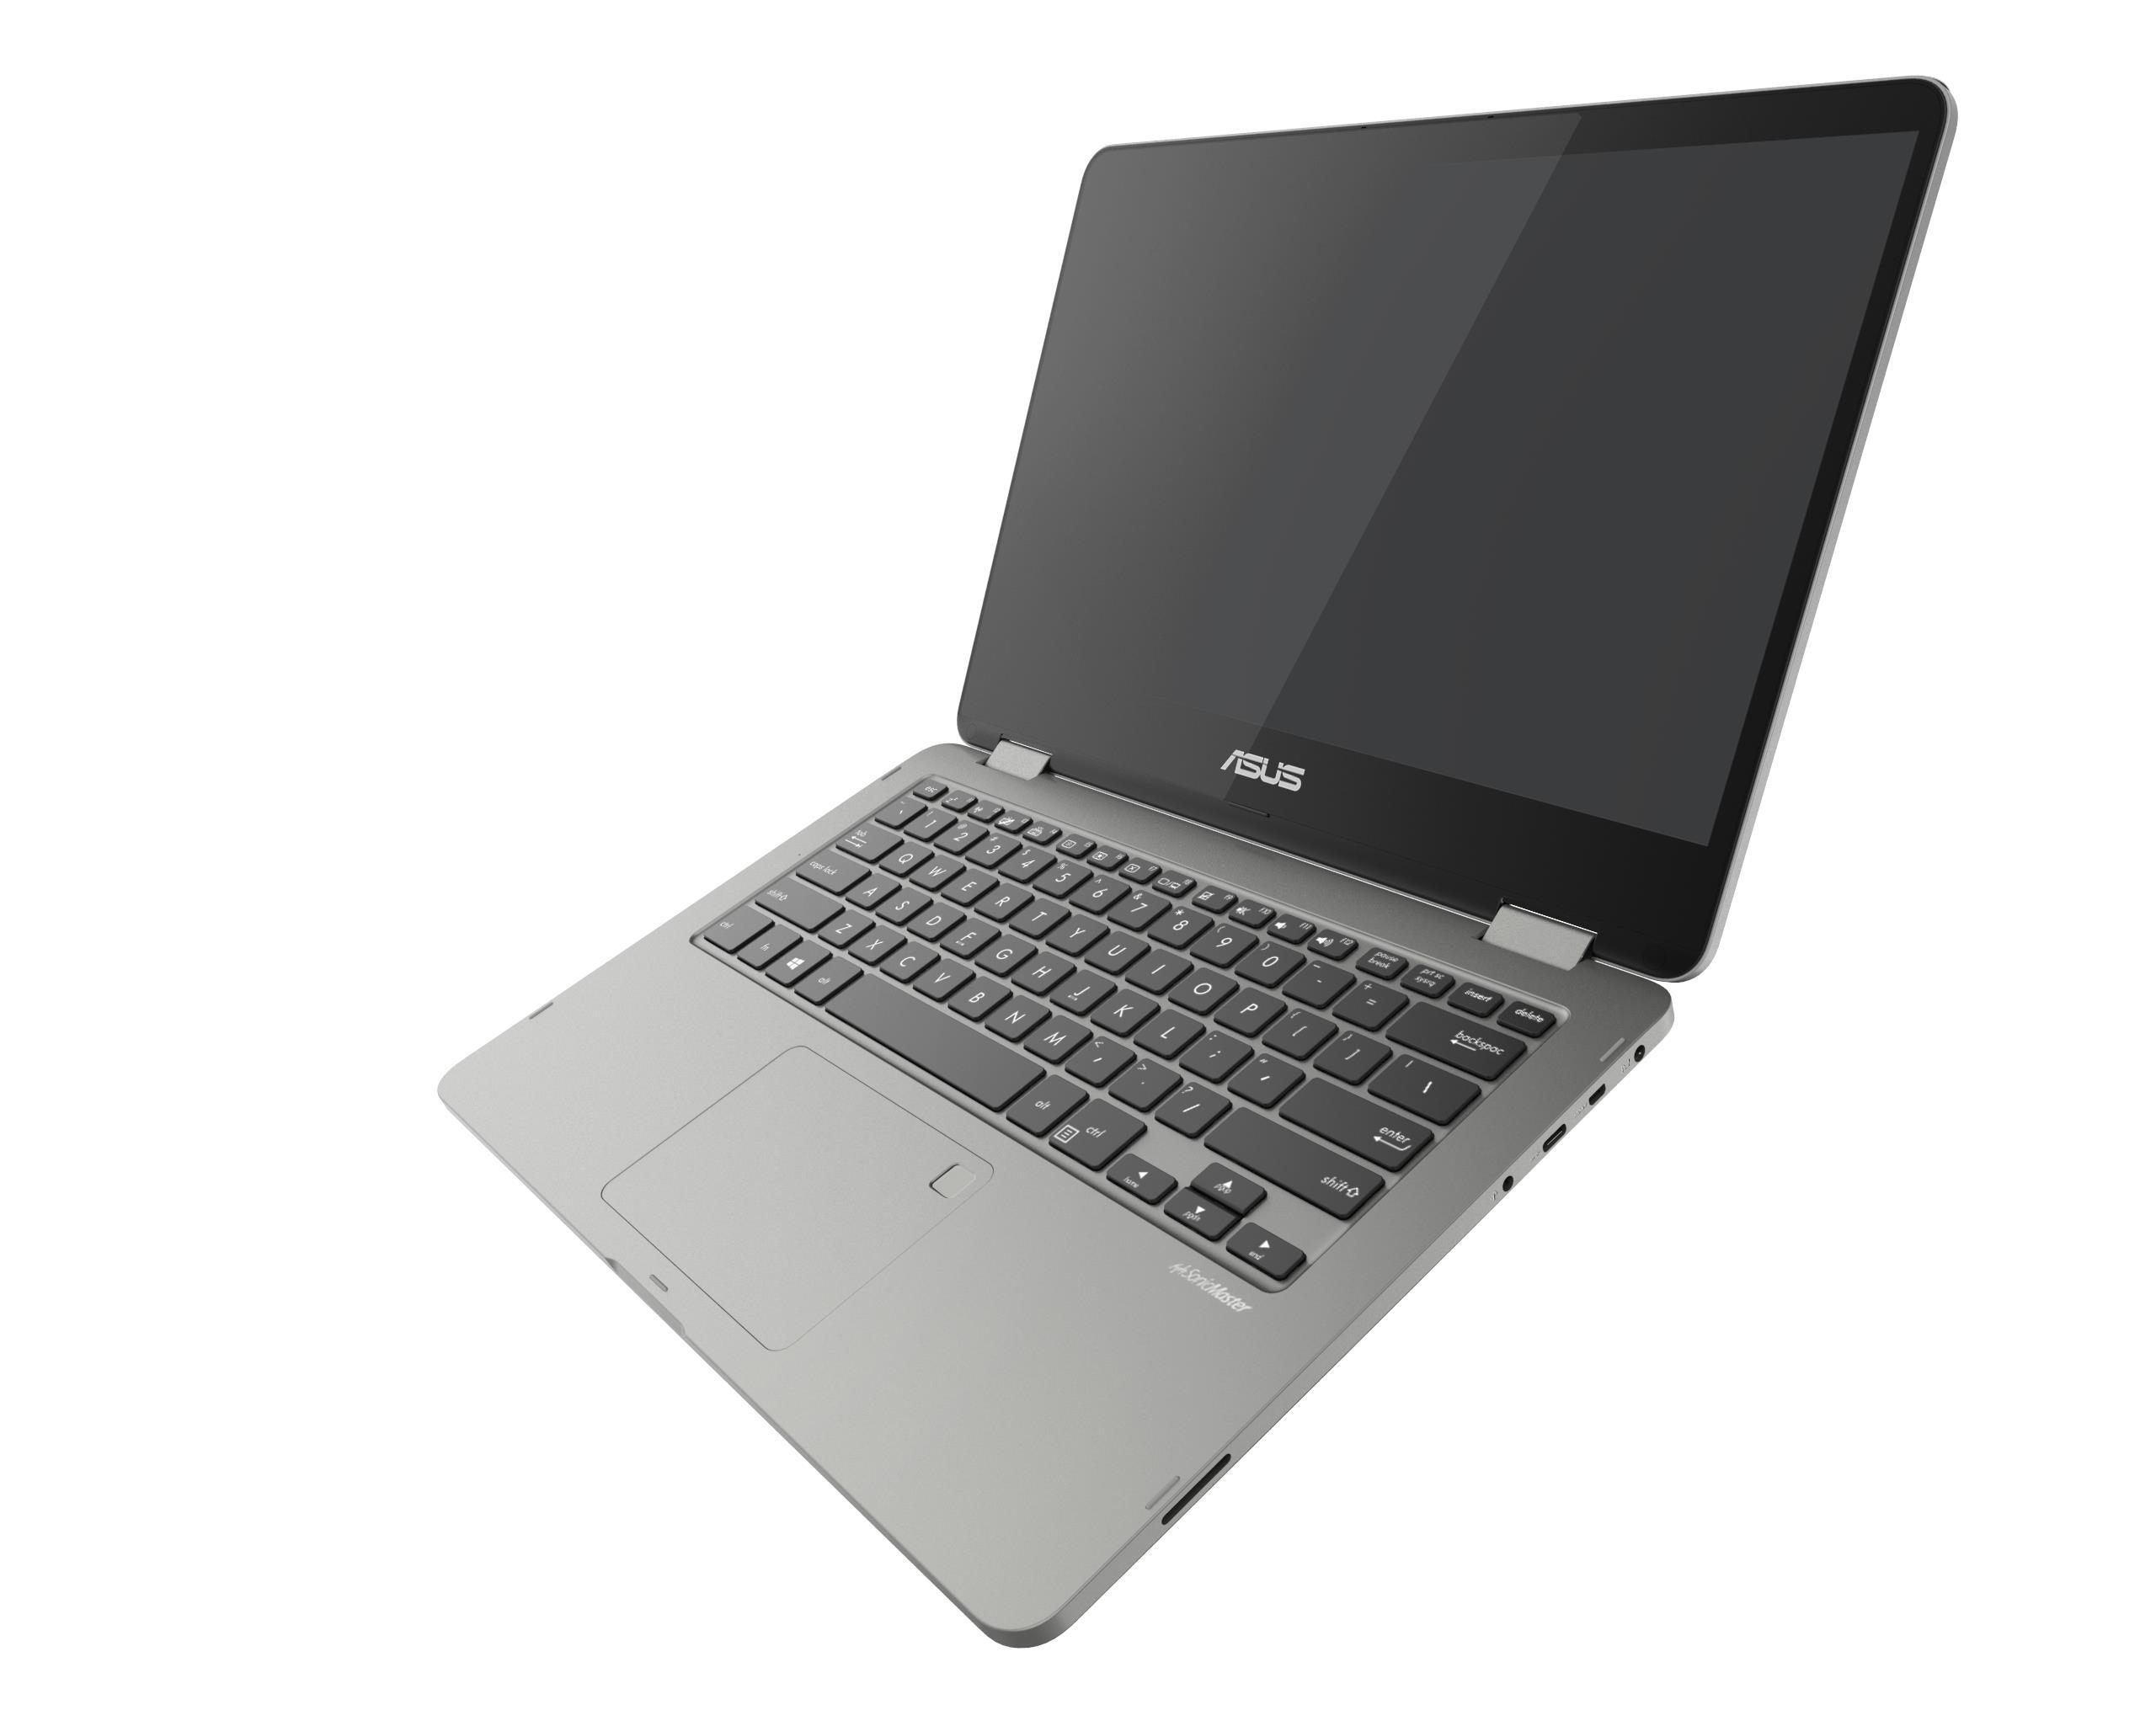 VivoBook Flip 變型筆電 / 華碩電腦股份有限公司